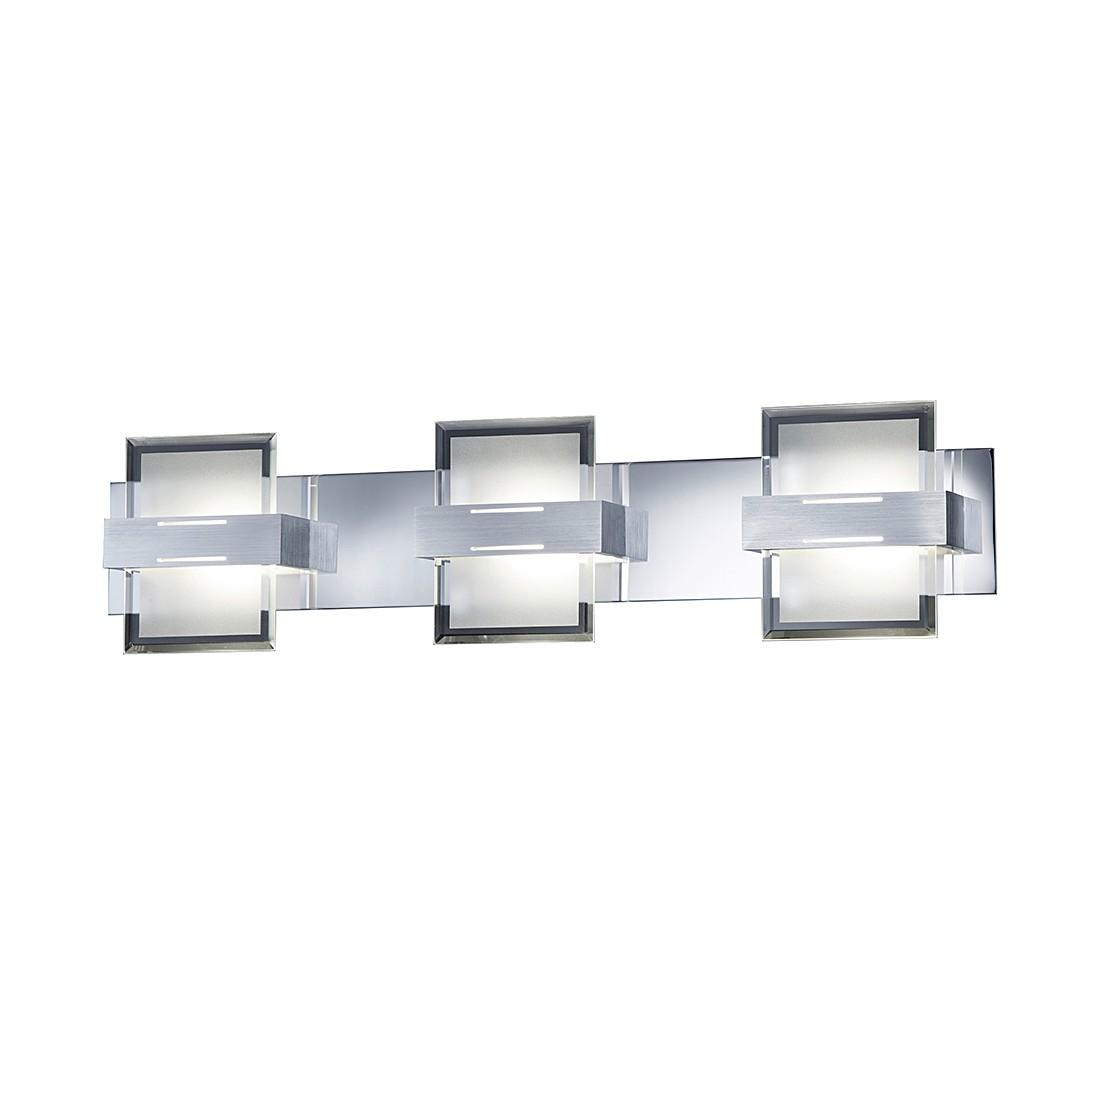 EEK A+, LED-Wandleuchte – 3-flammig, Trio günstig online kaufen